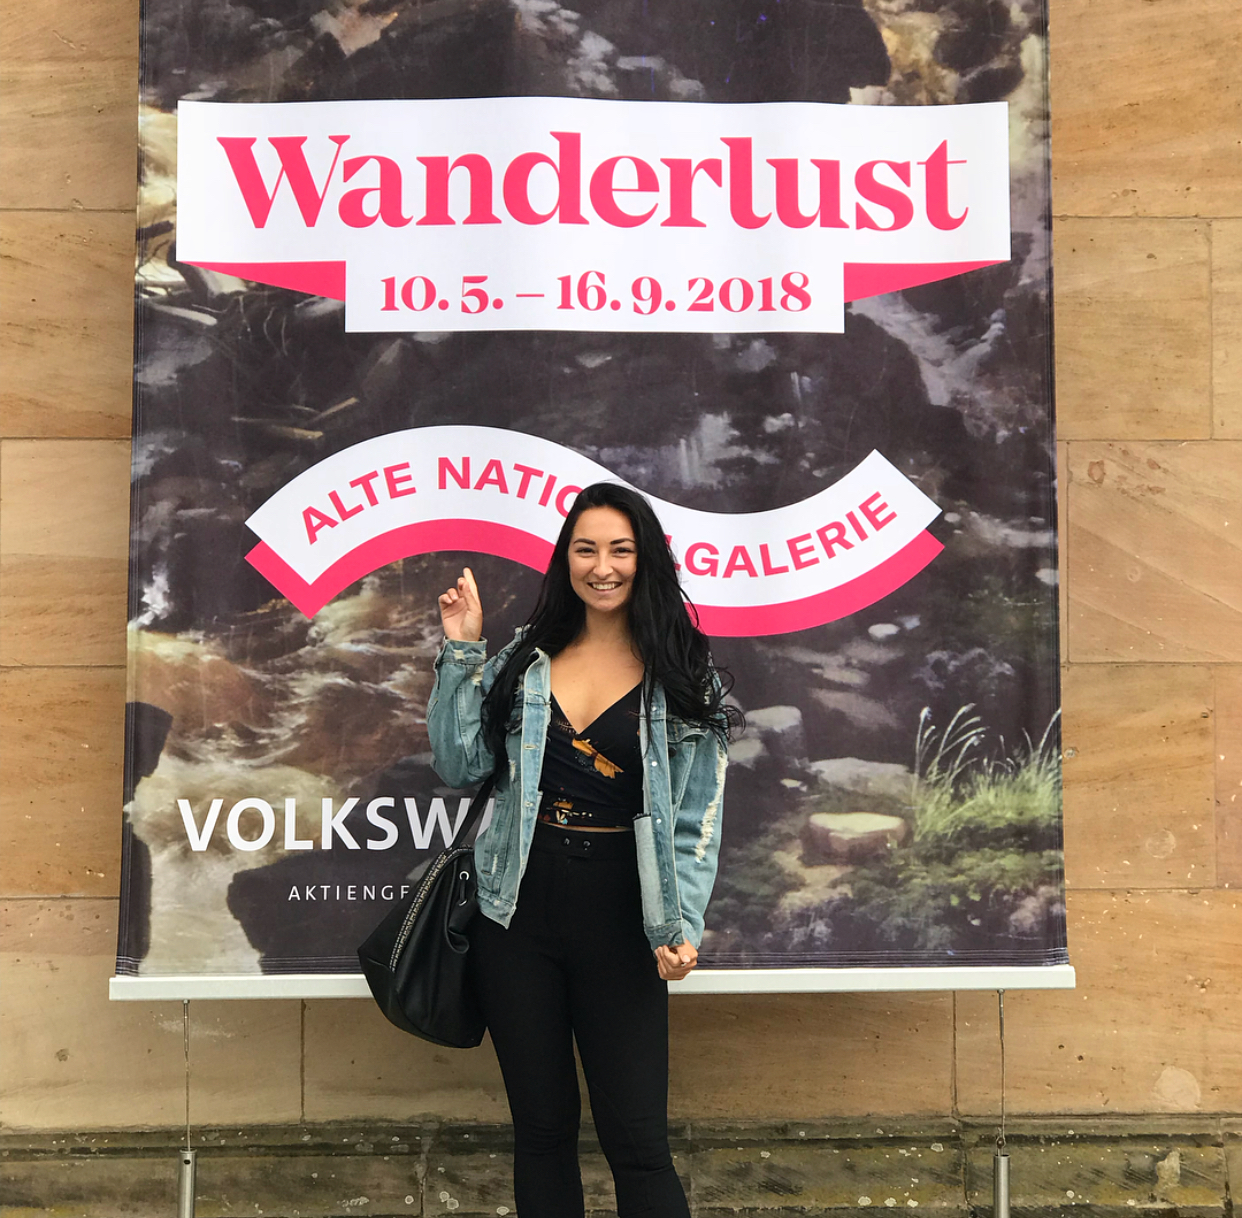 Ich habe Wanderlust (I have the desire to travel).